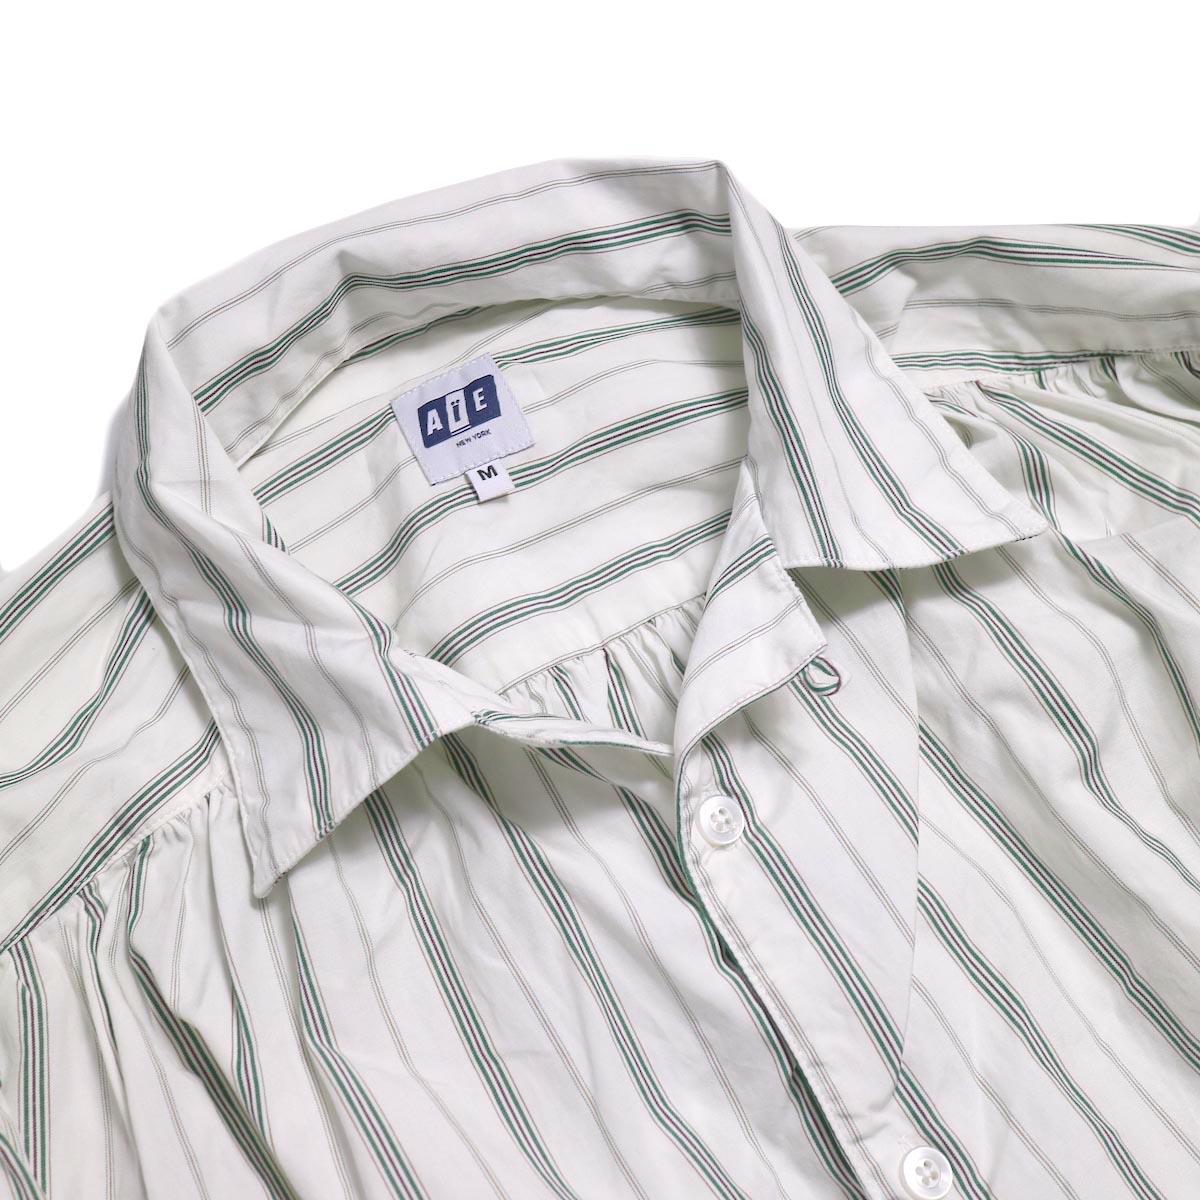 AiE / Painter Shirt -Regent St. (Grn/Wht)  オープンカラー